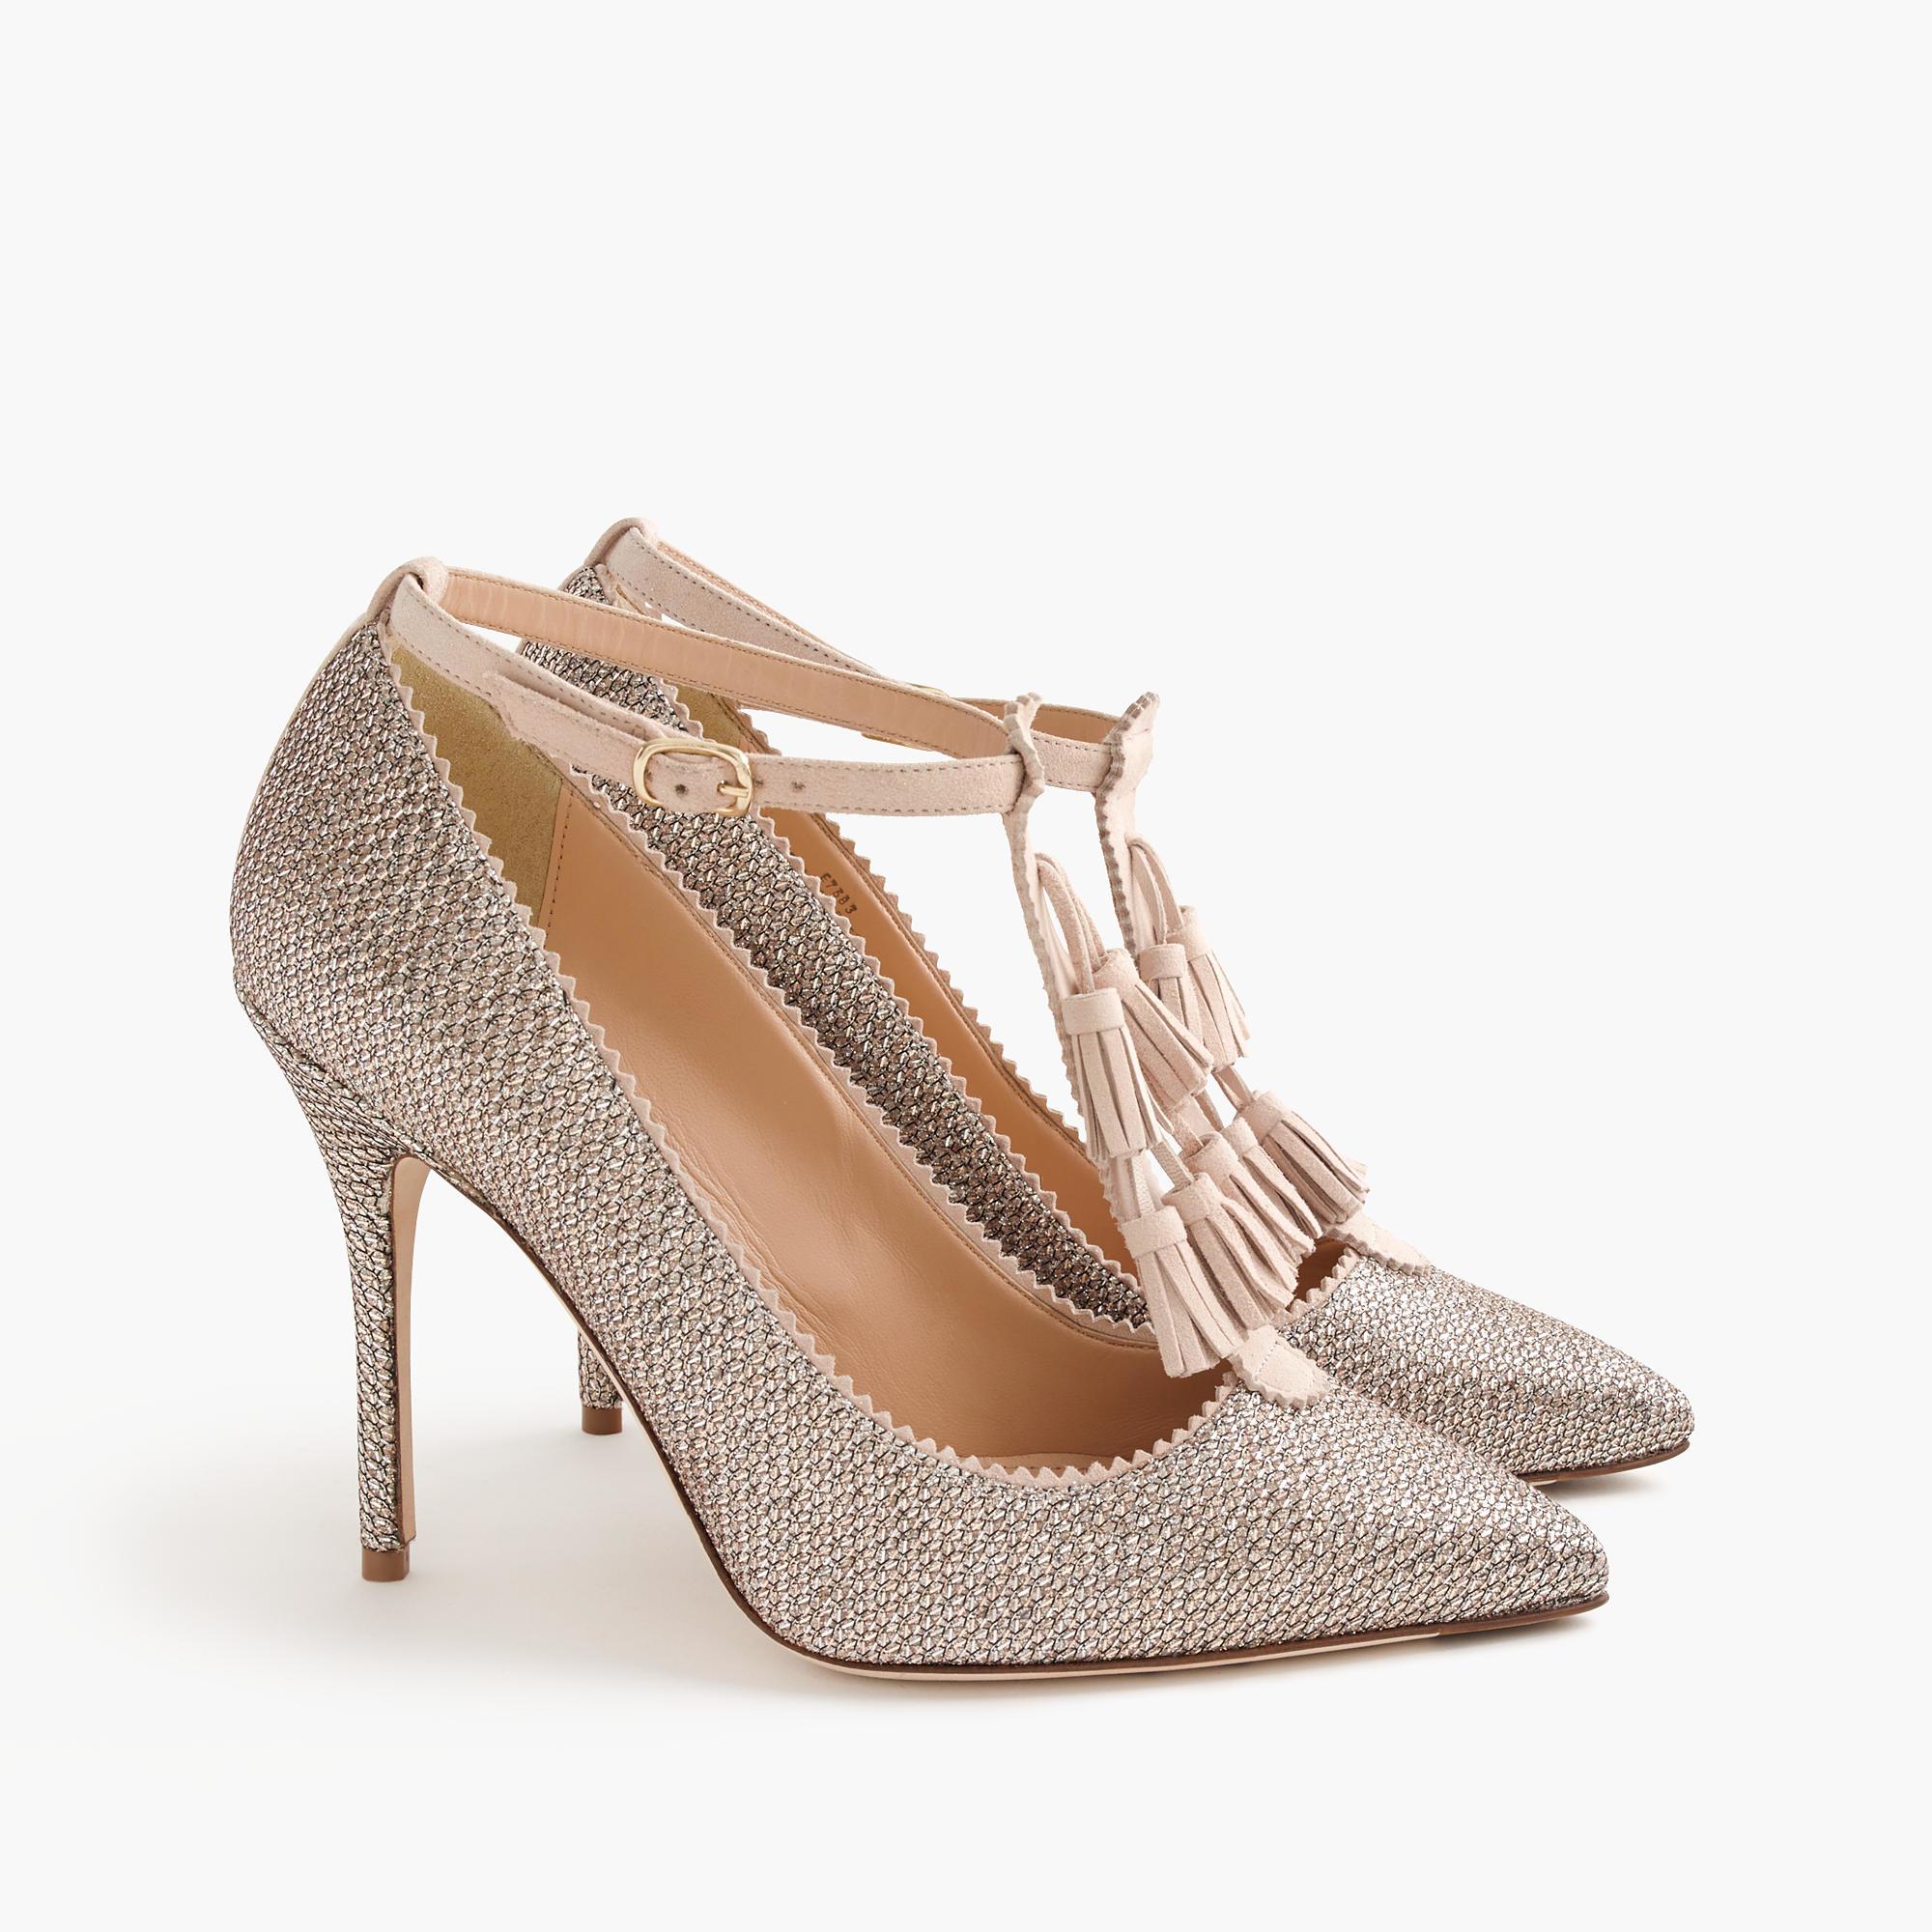 Pale Grey Court Shoes Uk